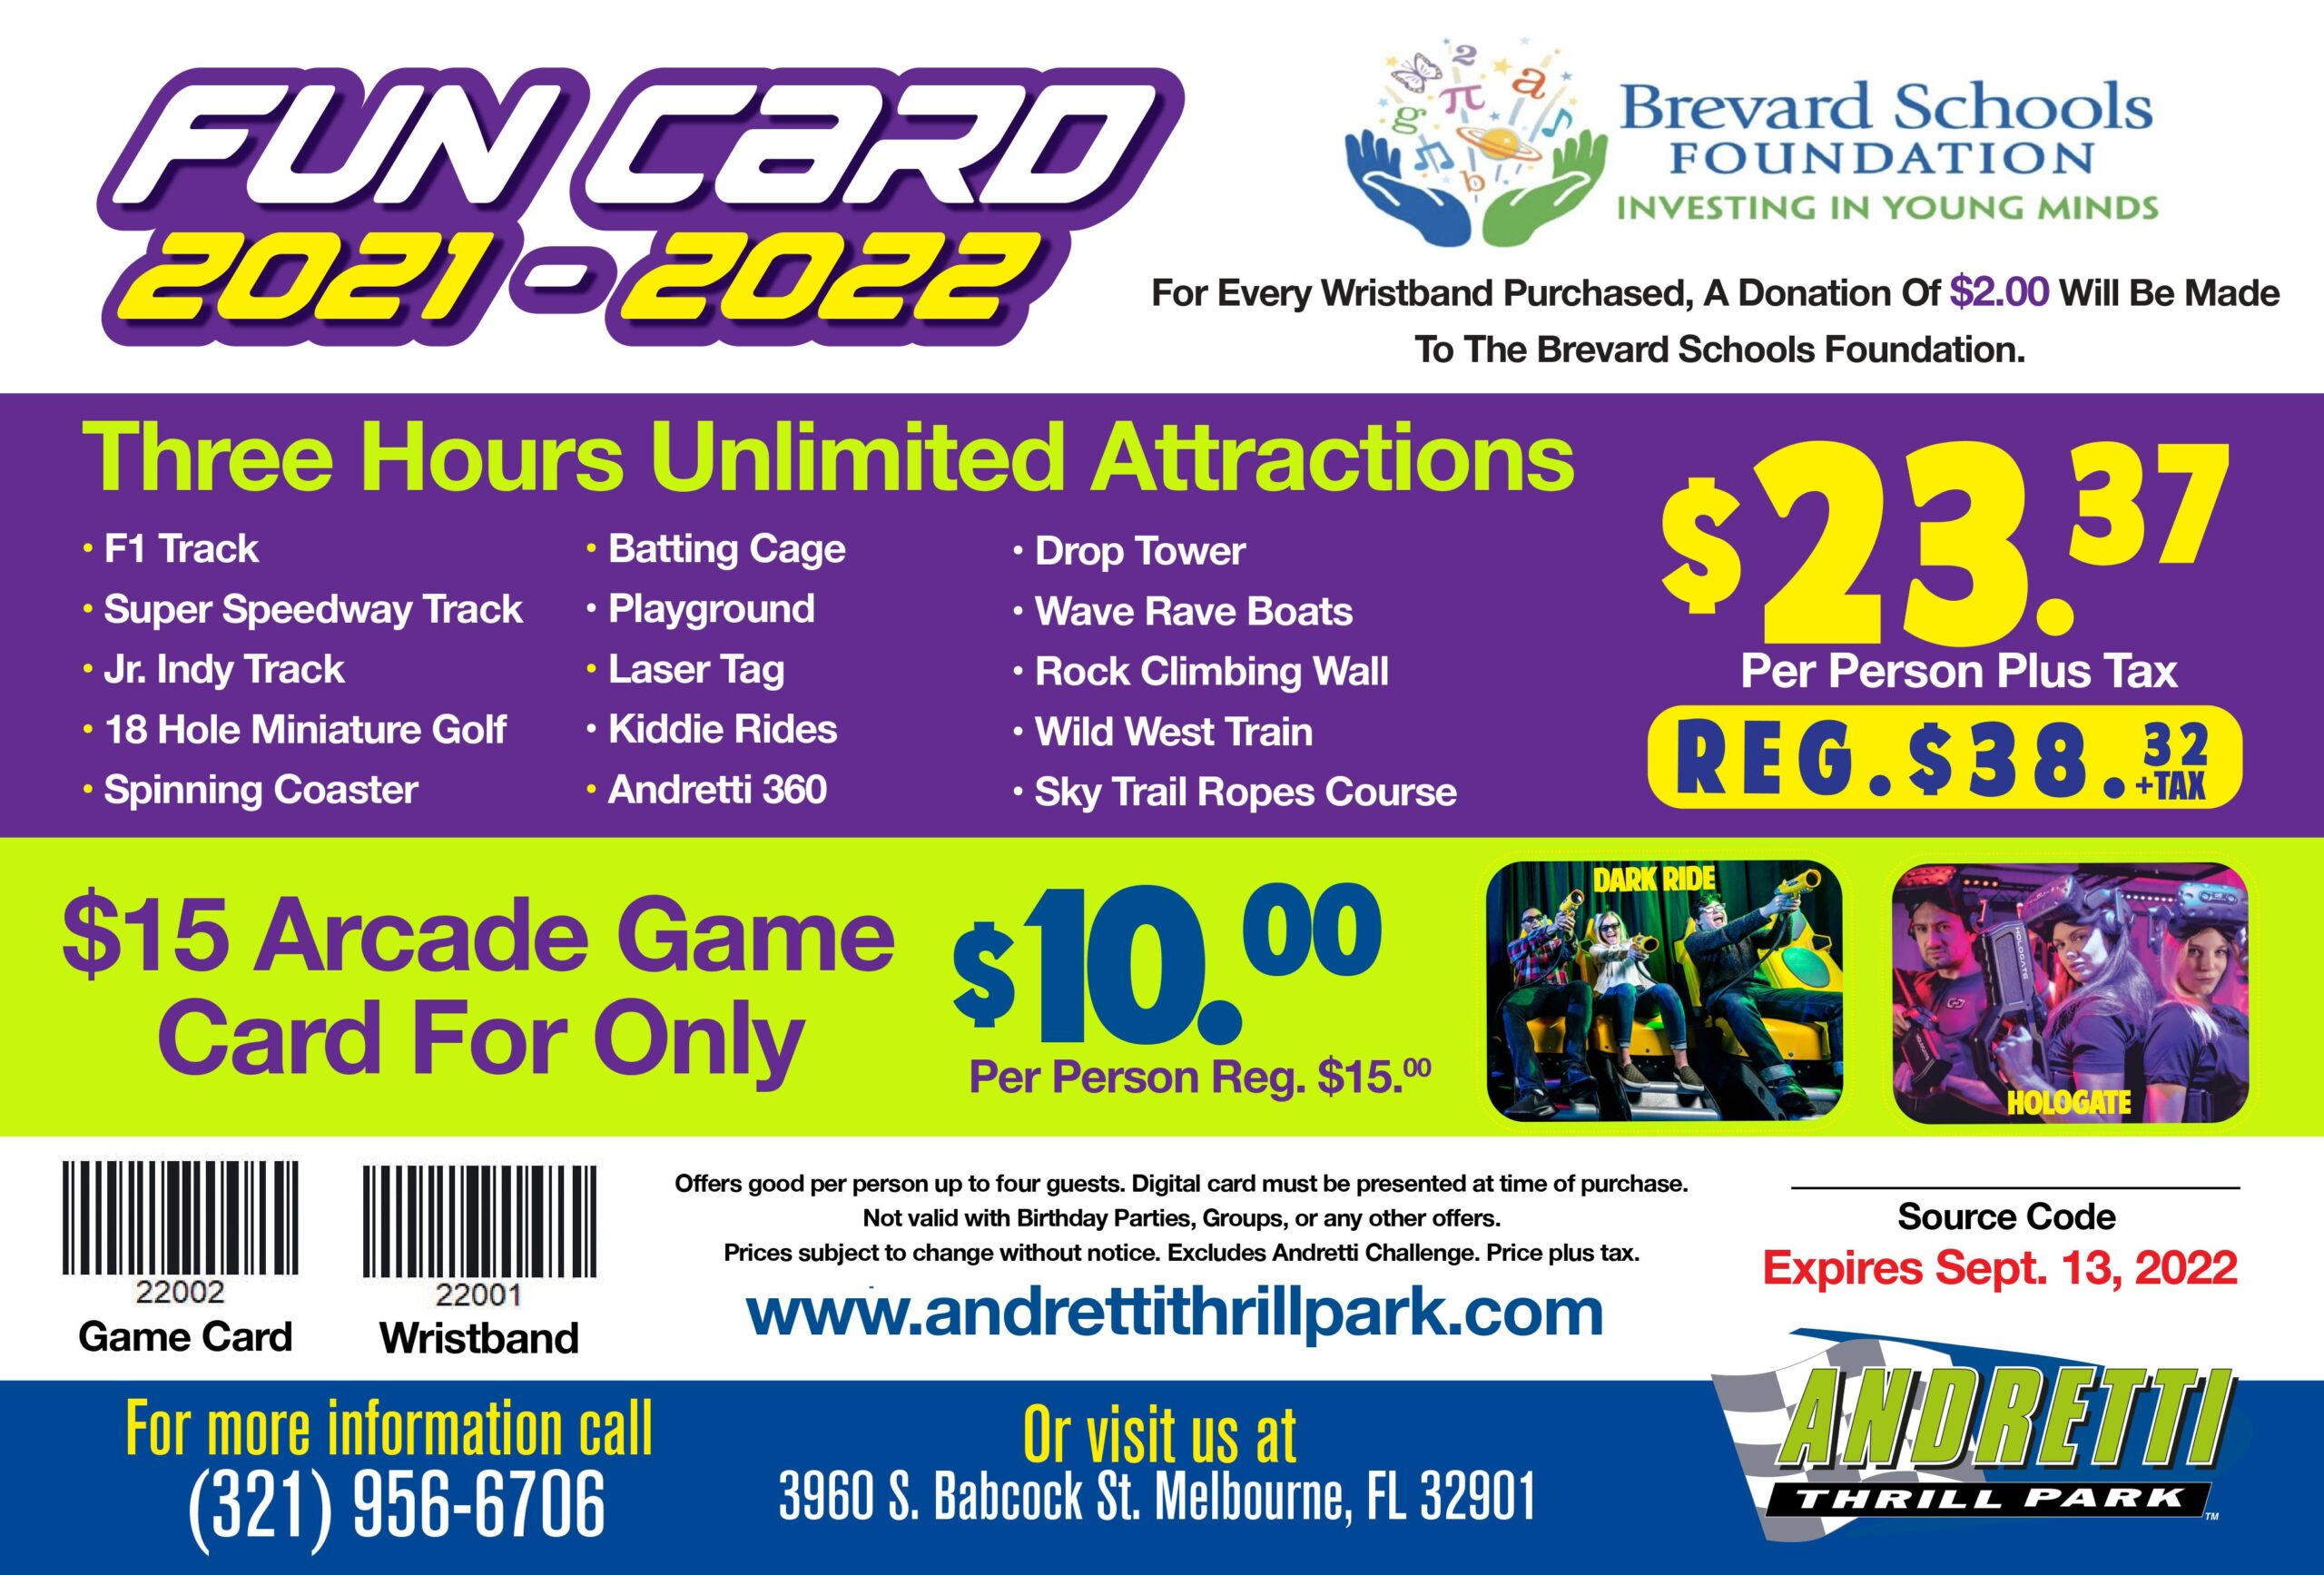 FunCard 2022